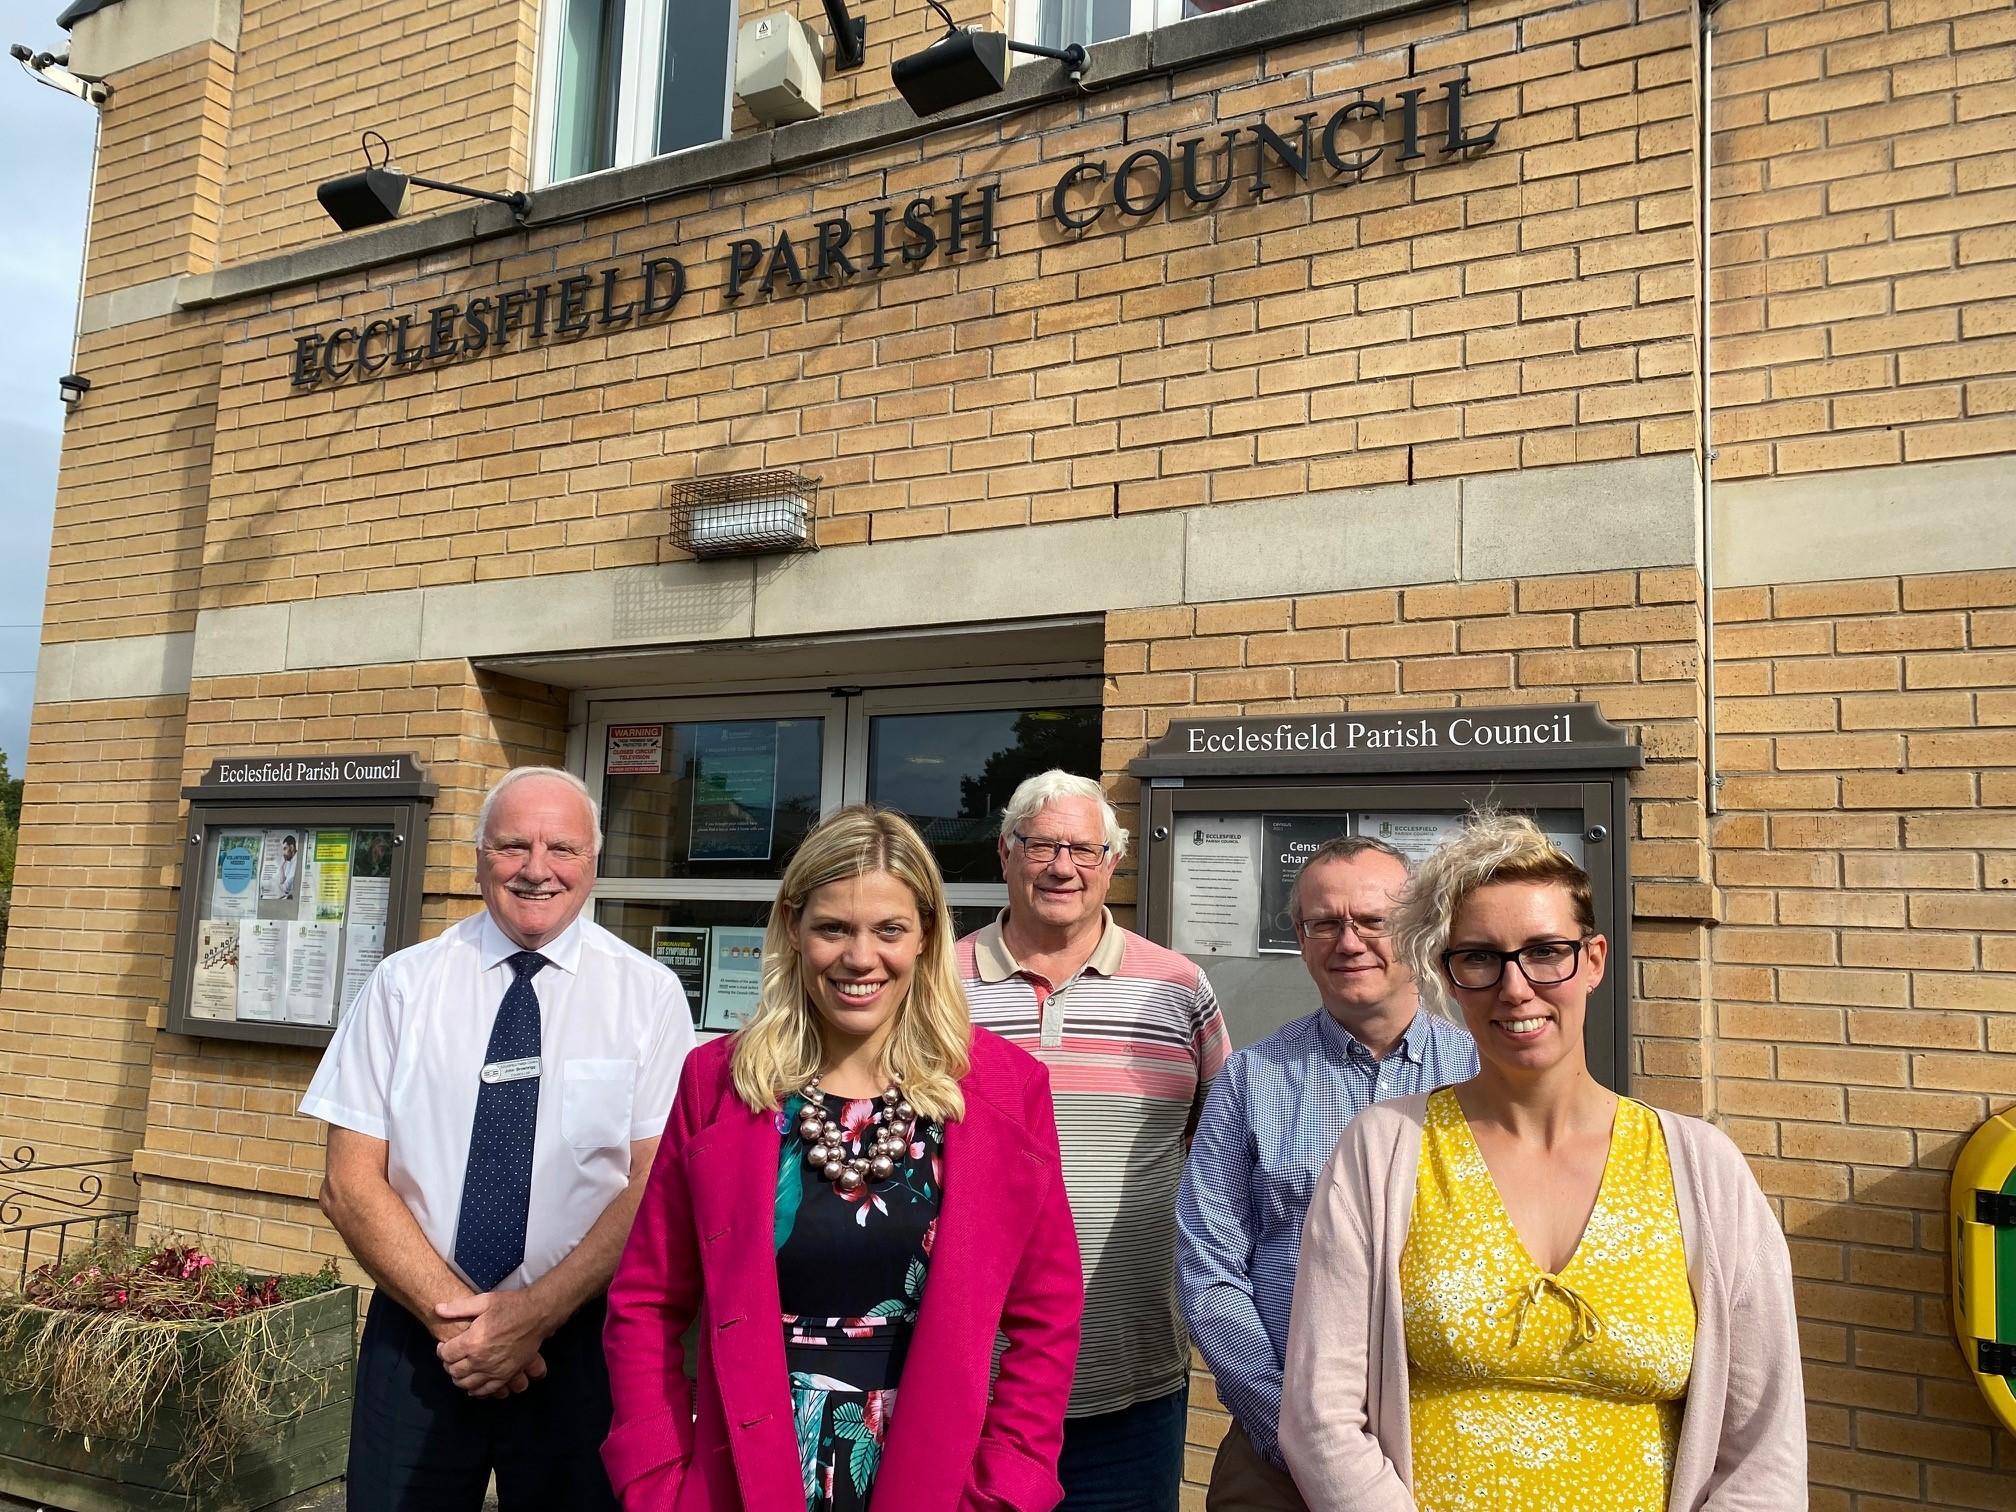 Our MP comes to visit the Parish Council